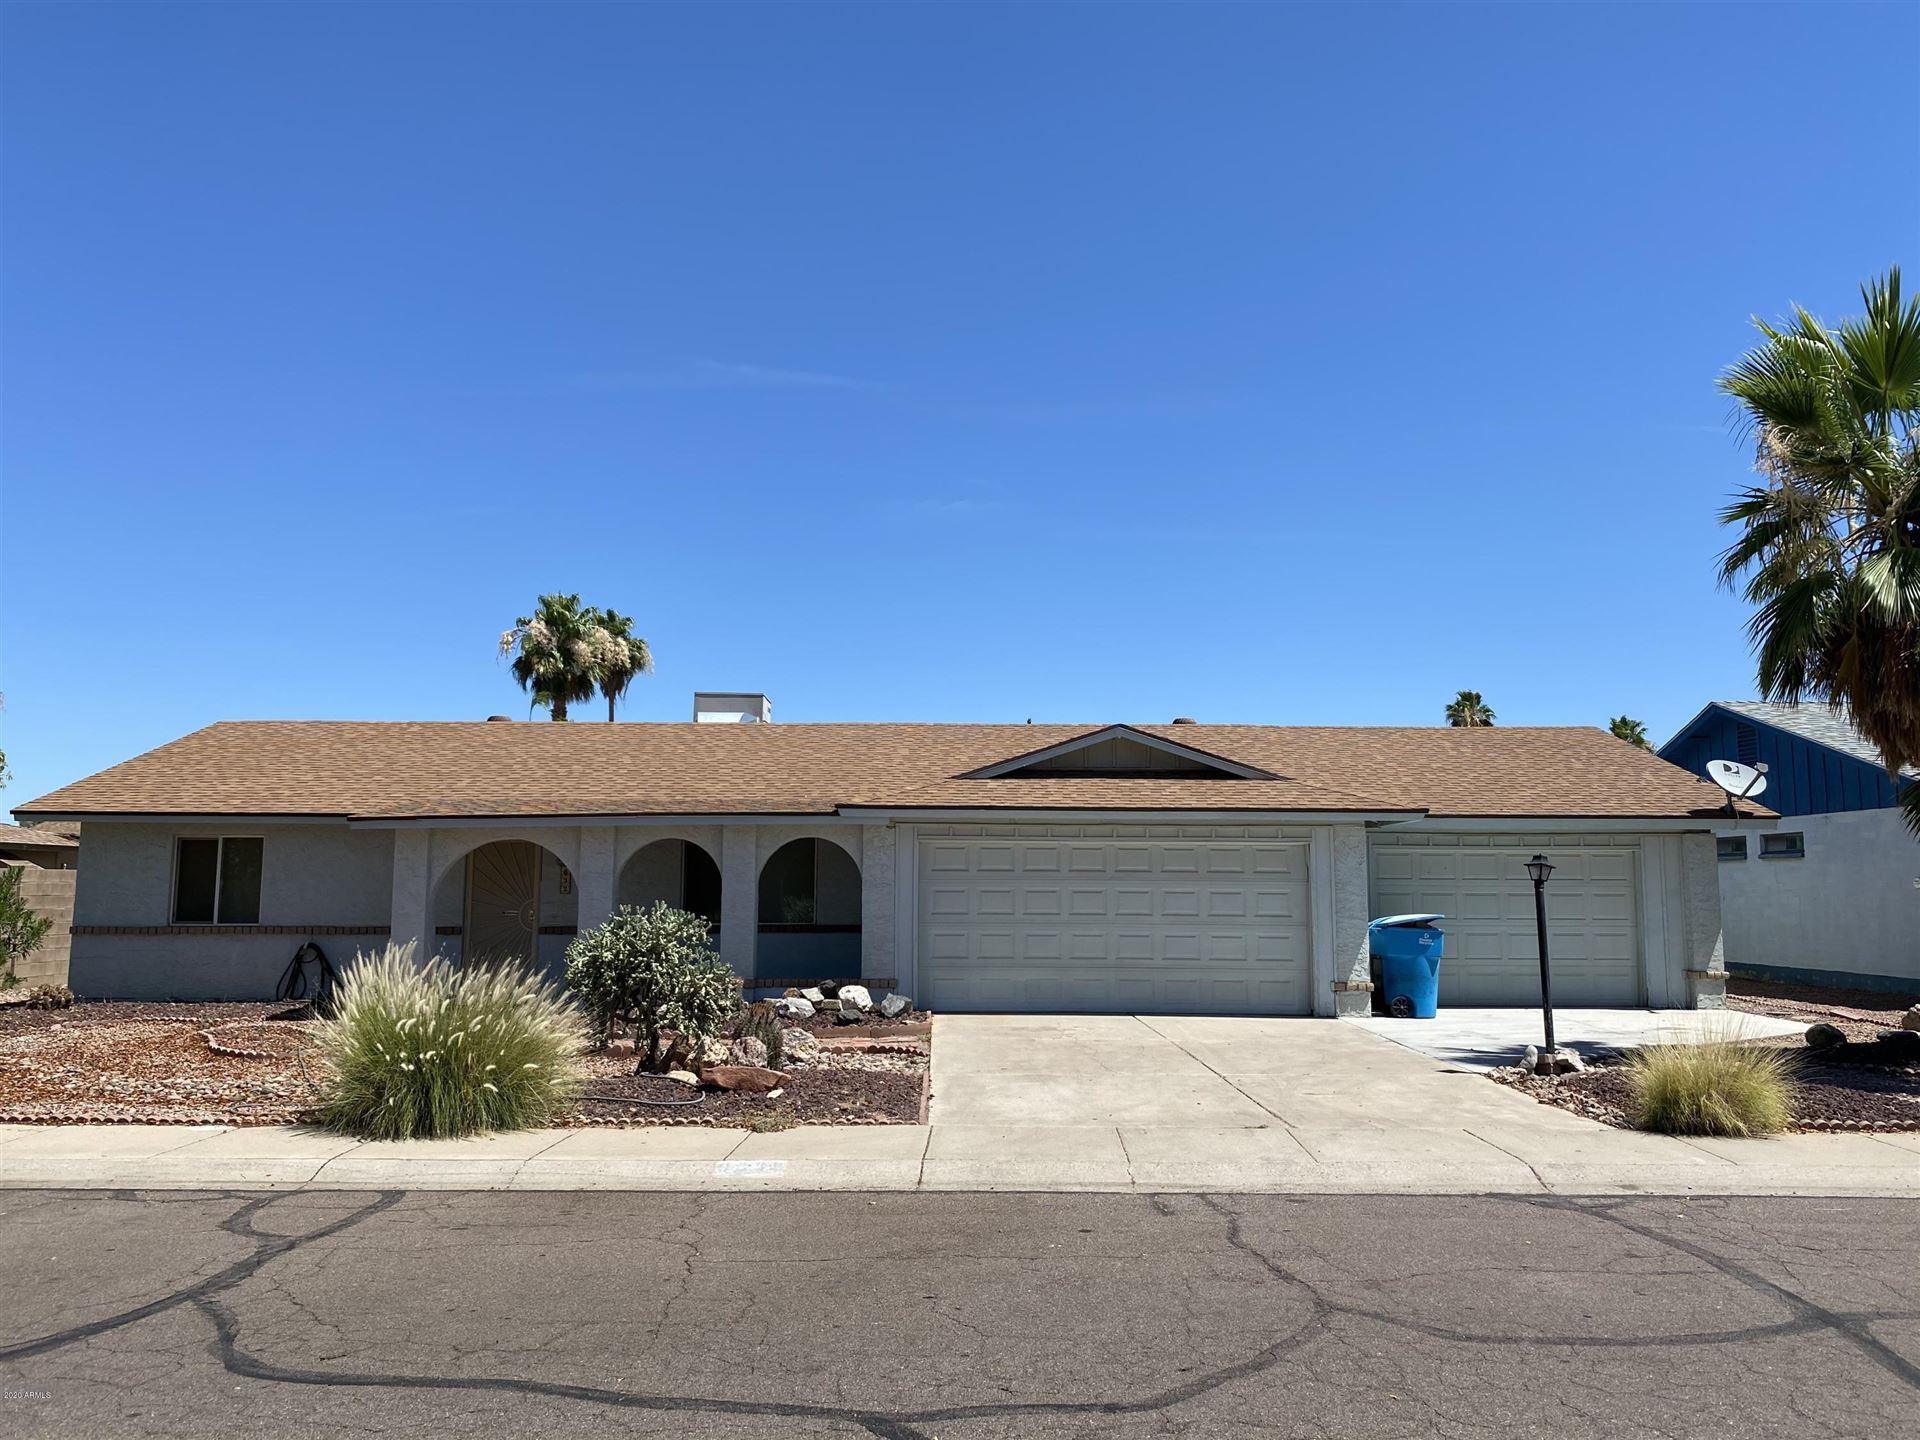 3632 W BLUEFIELD Avenue, Glendale, AZ 85308 - #: 6092279